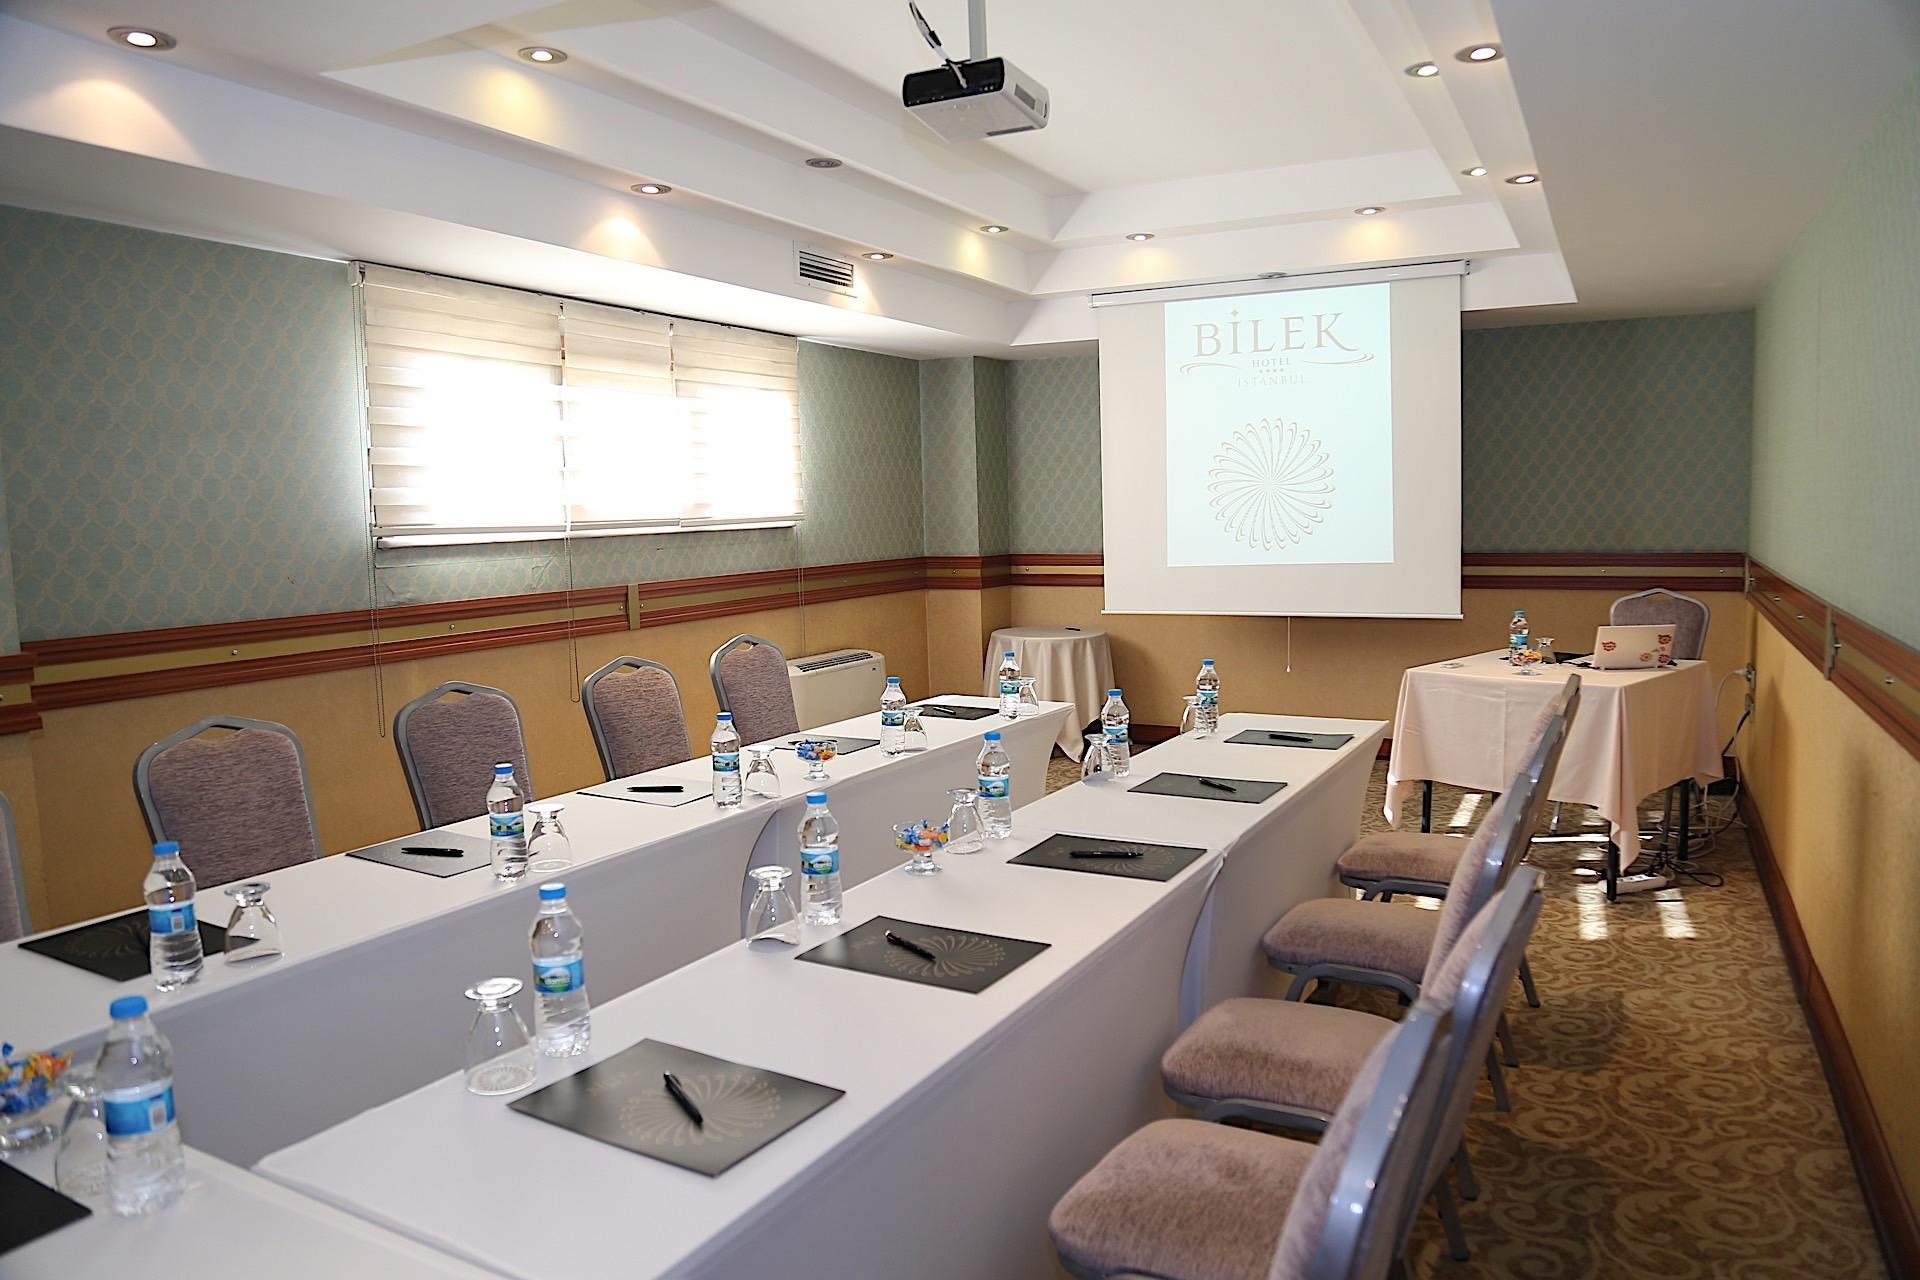 Meeting room at Bilek Hotel Istanbul